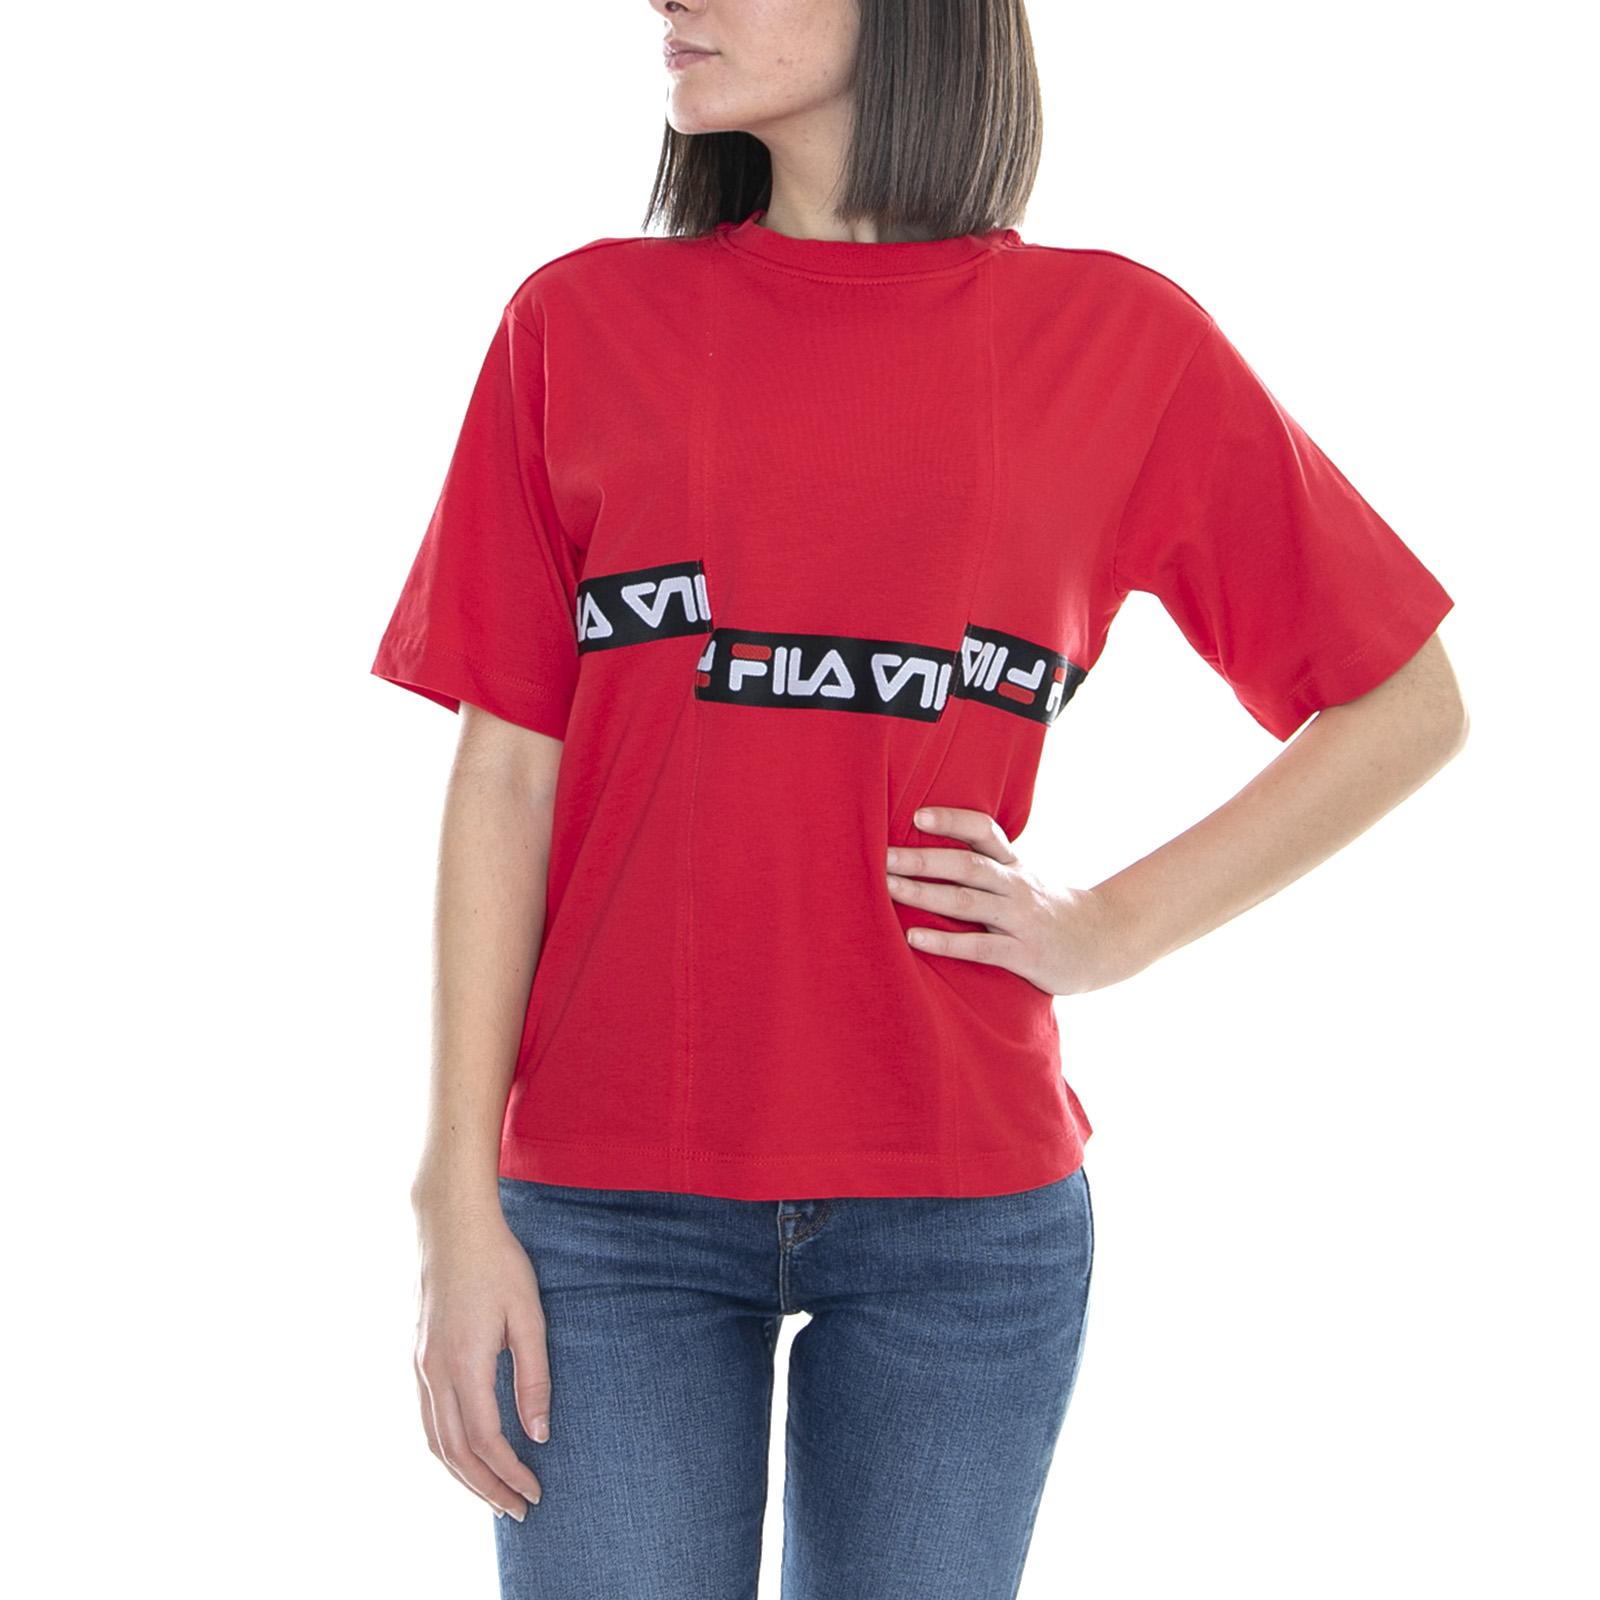 True Women Maglietta Red T Shirt Corta Tee Donna Fila Manica Charo pSUzVM